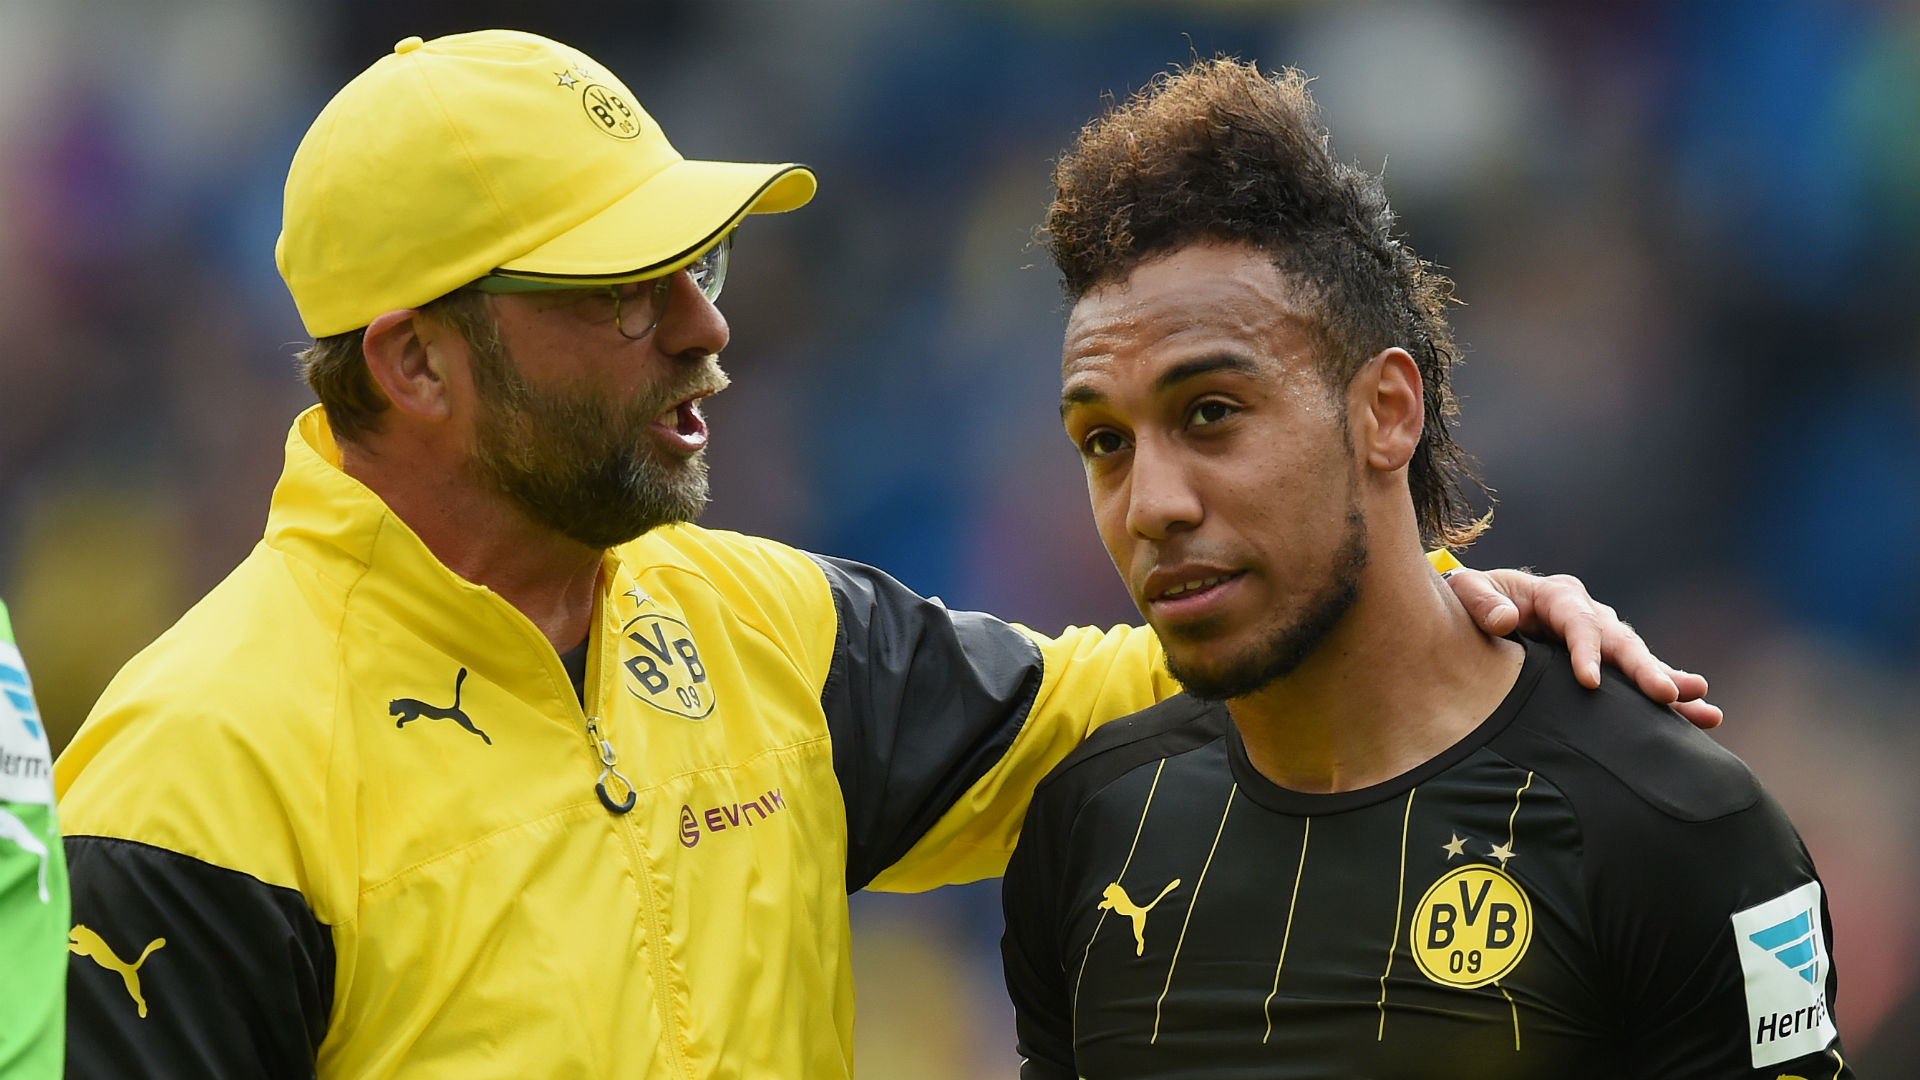 Jurgen Klopp Pierre-Emerick Aubameyang Borussia Dortmund 02052015